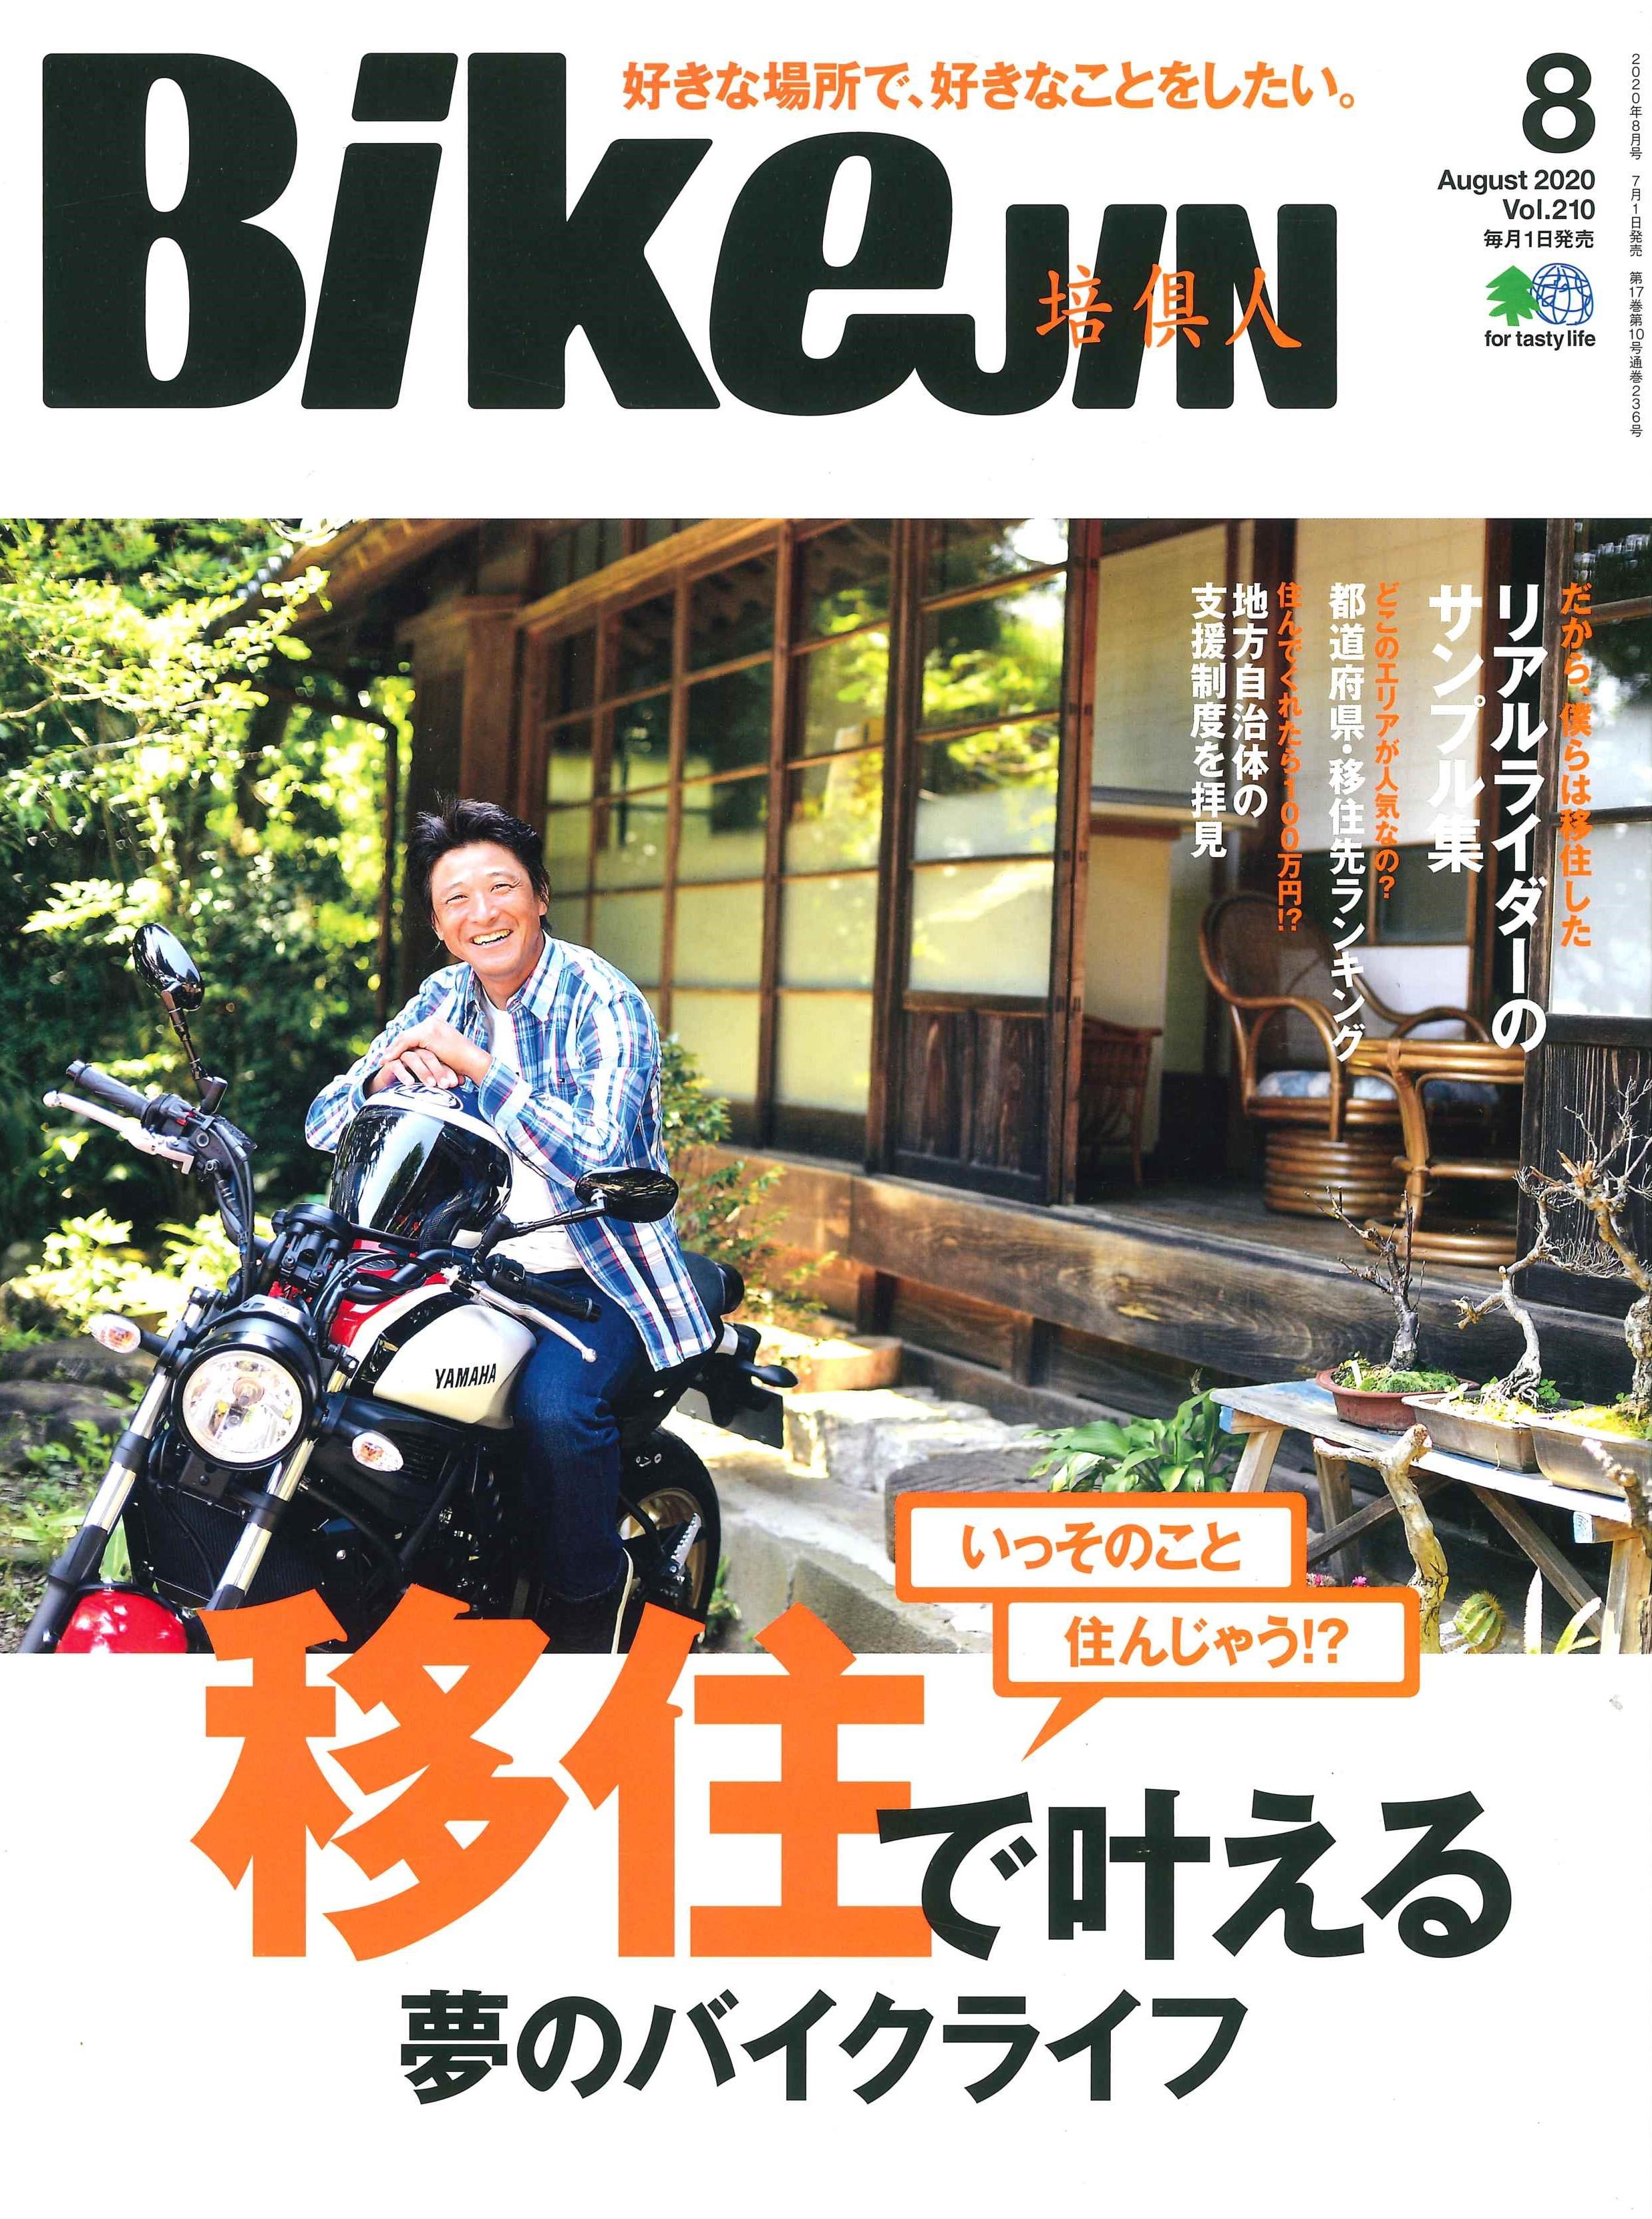 【BikeJin 2020年8月号掲載】『SYGNHOUSE MOUNT SYSTEM』